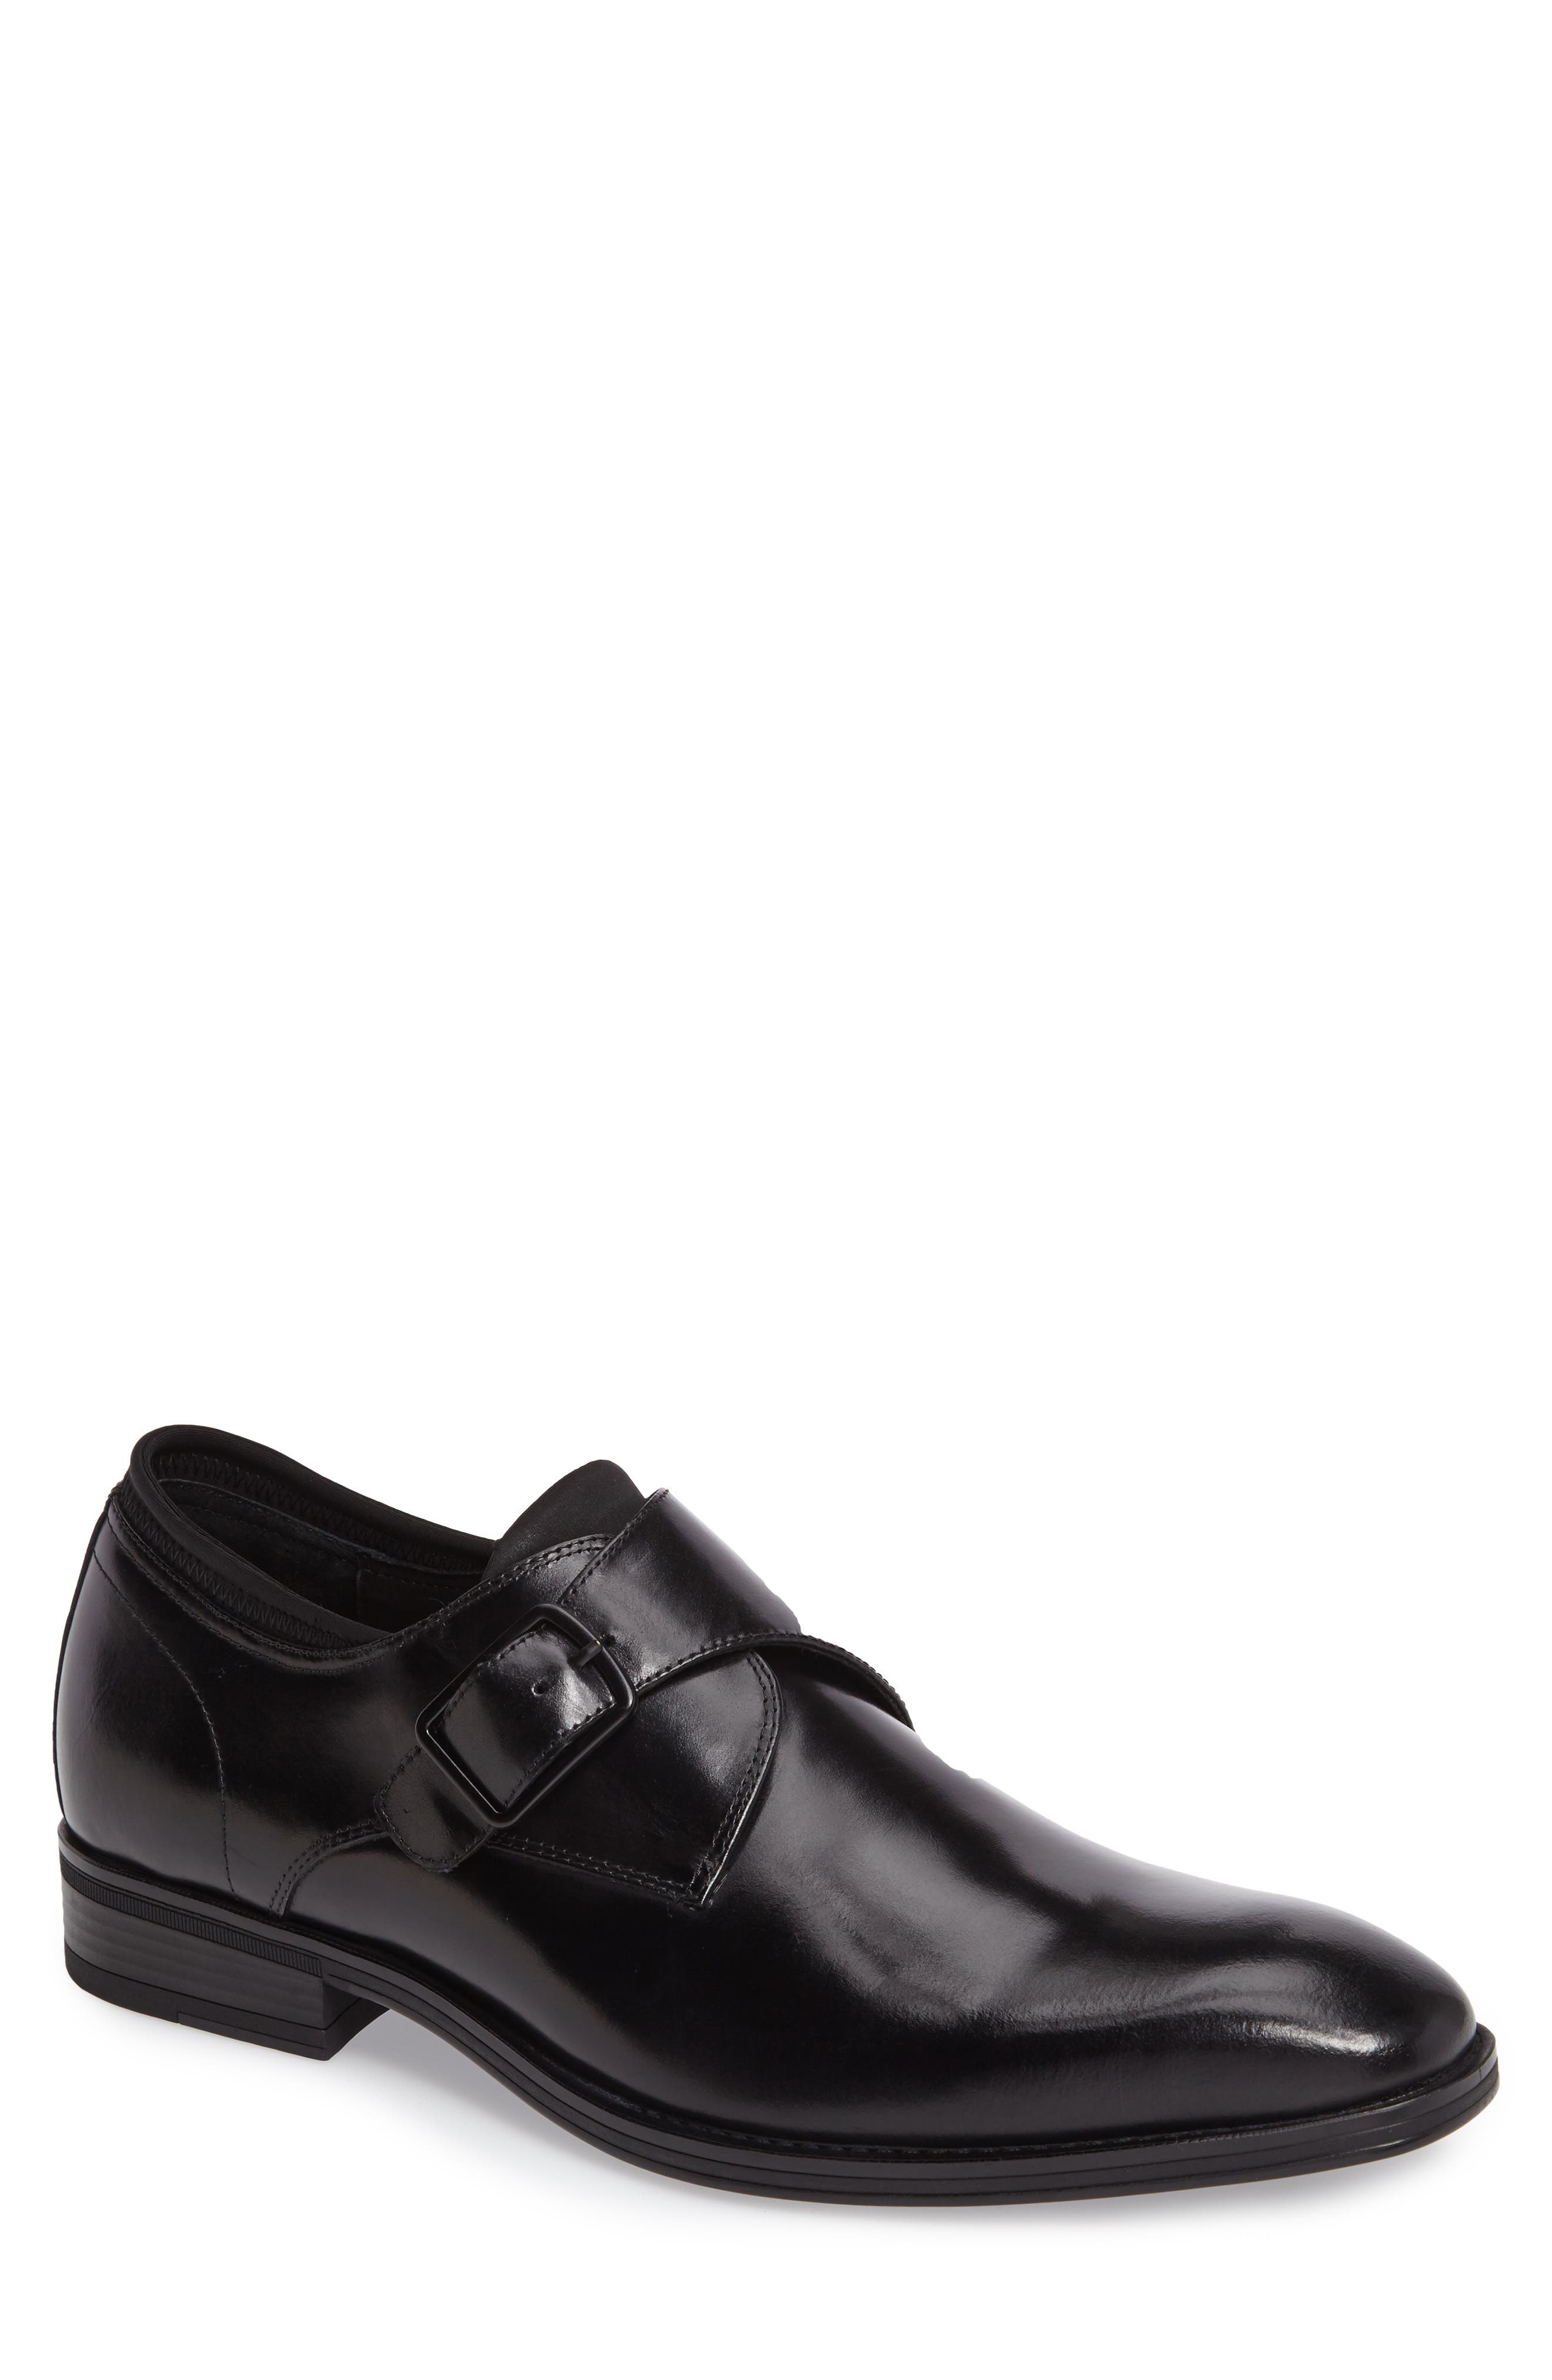 Main Image - Kenneth Cole New York Shock Wave Monk Shoe (Men)